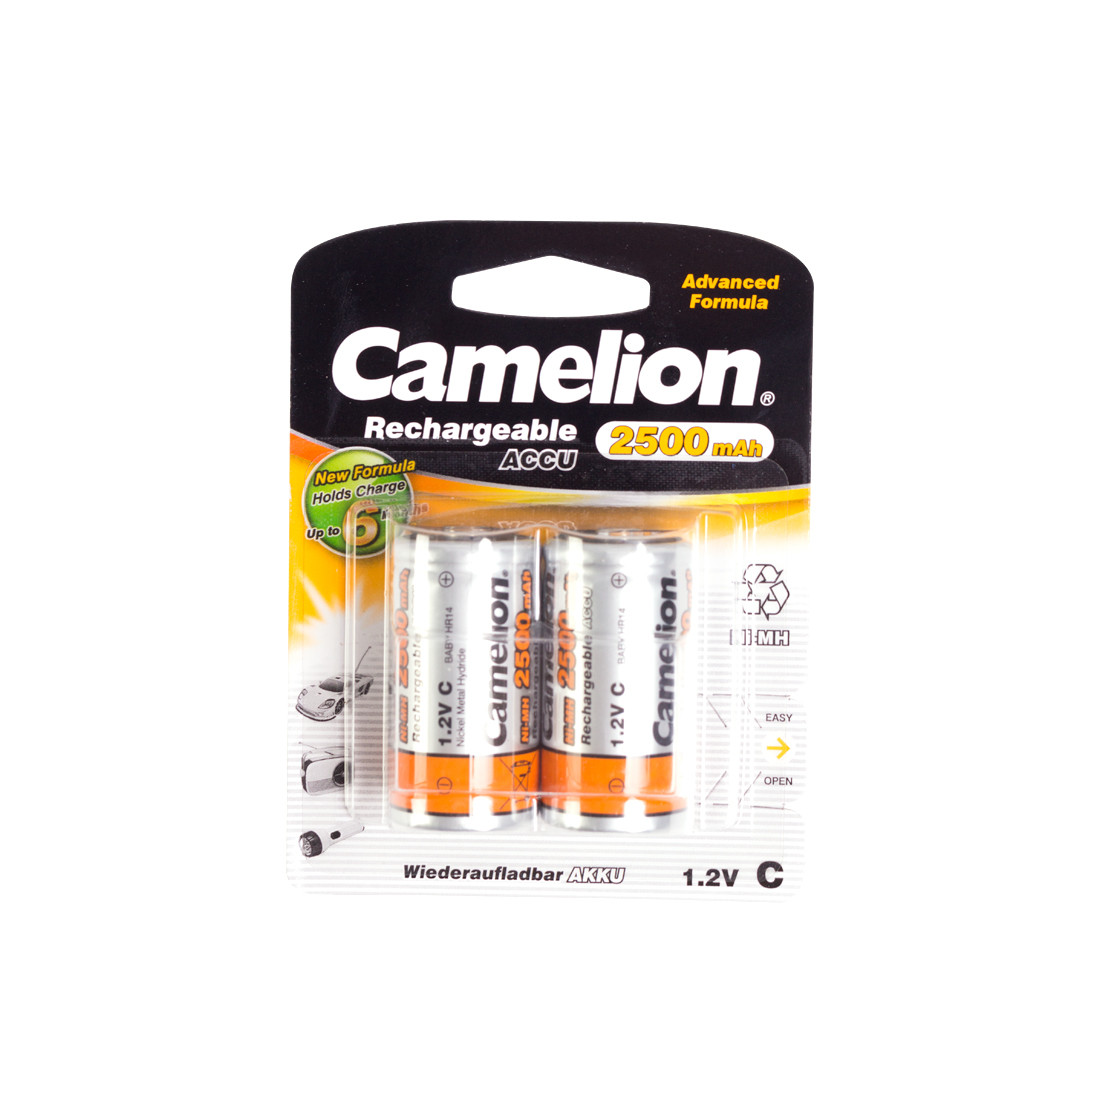 Аккумулятор, CAMELION, NH-C2500BP2, Rechargeable, C, 1.2V, , 2 шт., Блистер